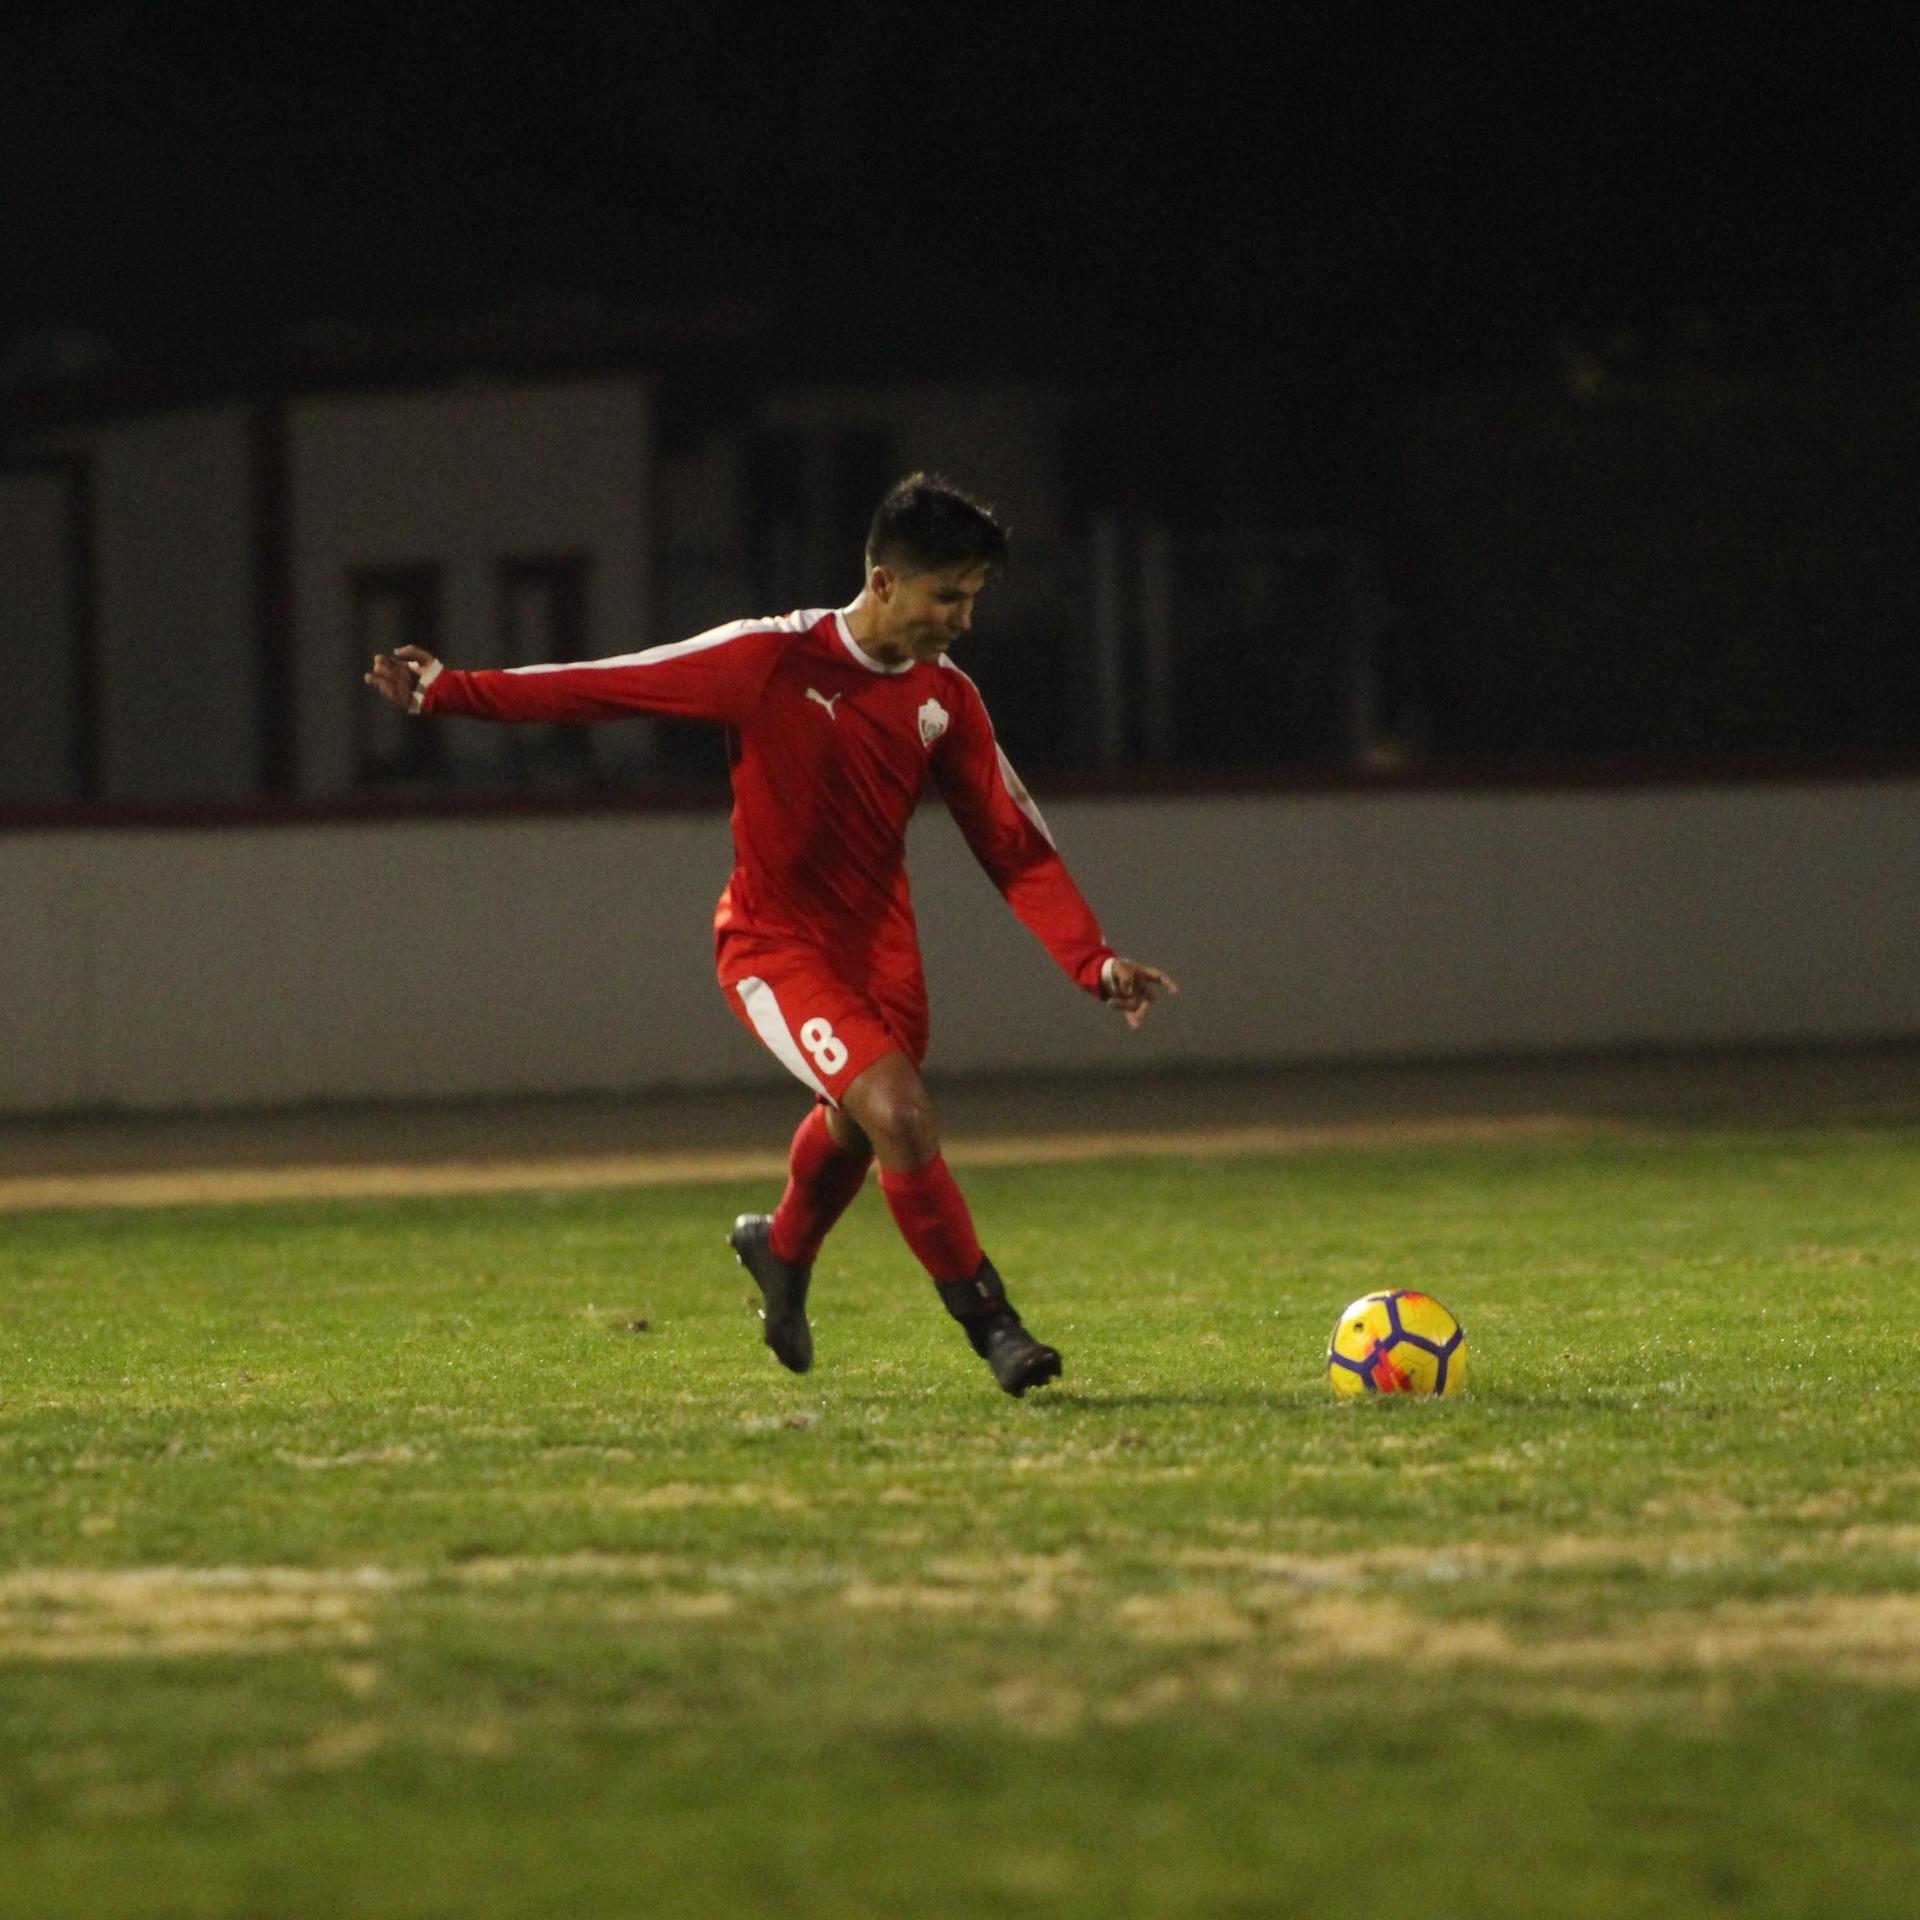 Favian Casillas kicking